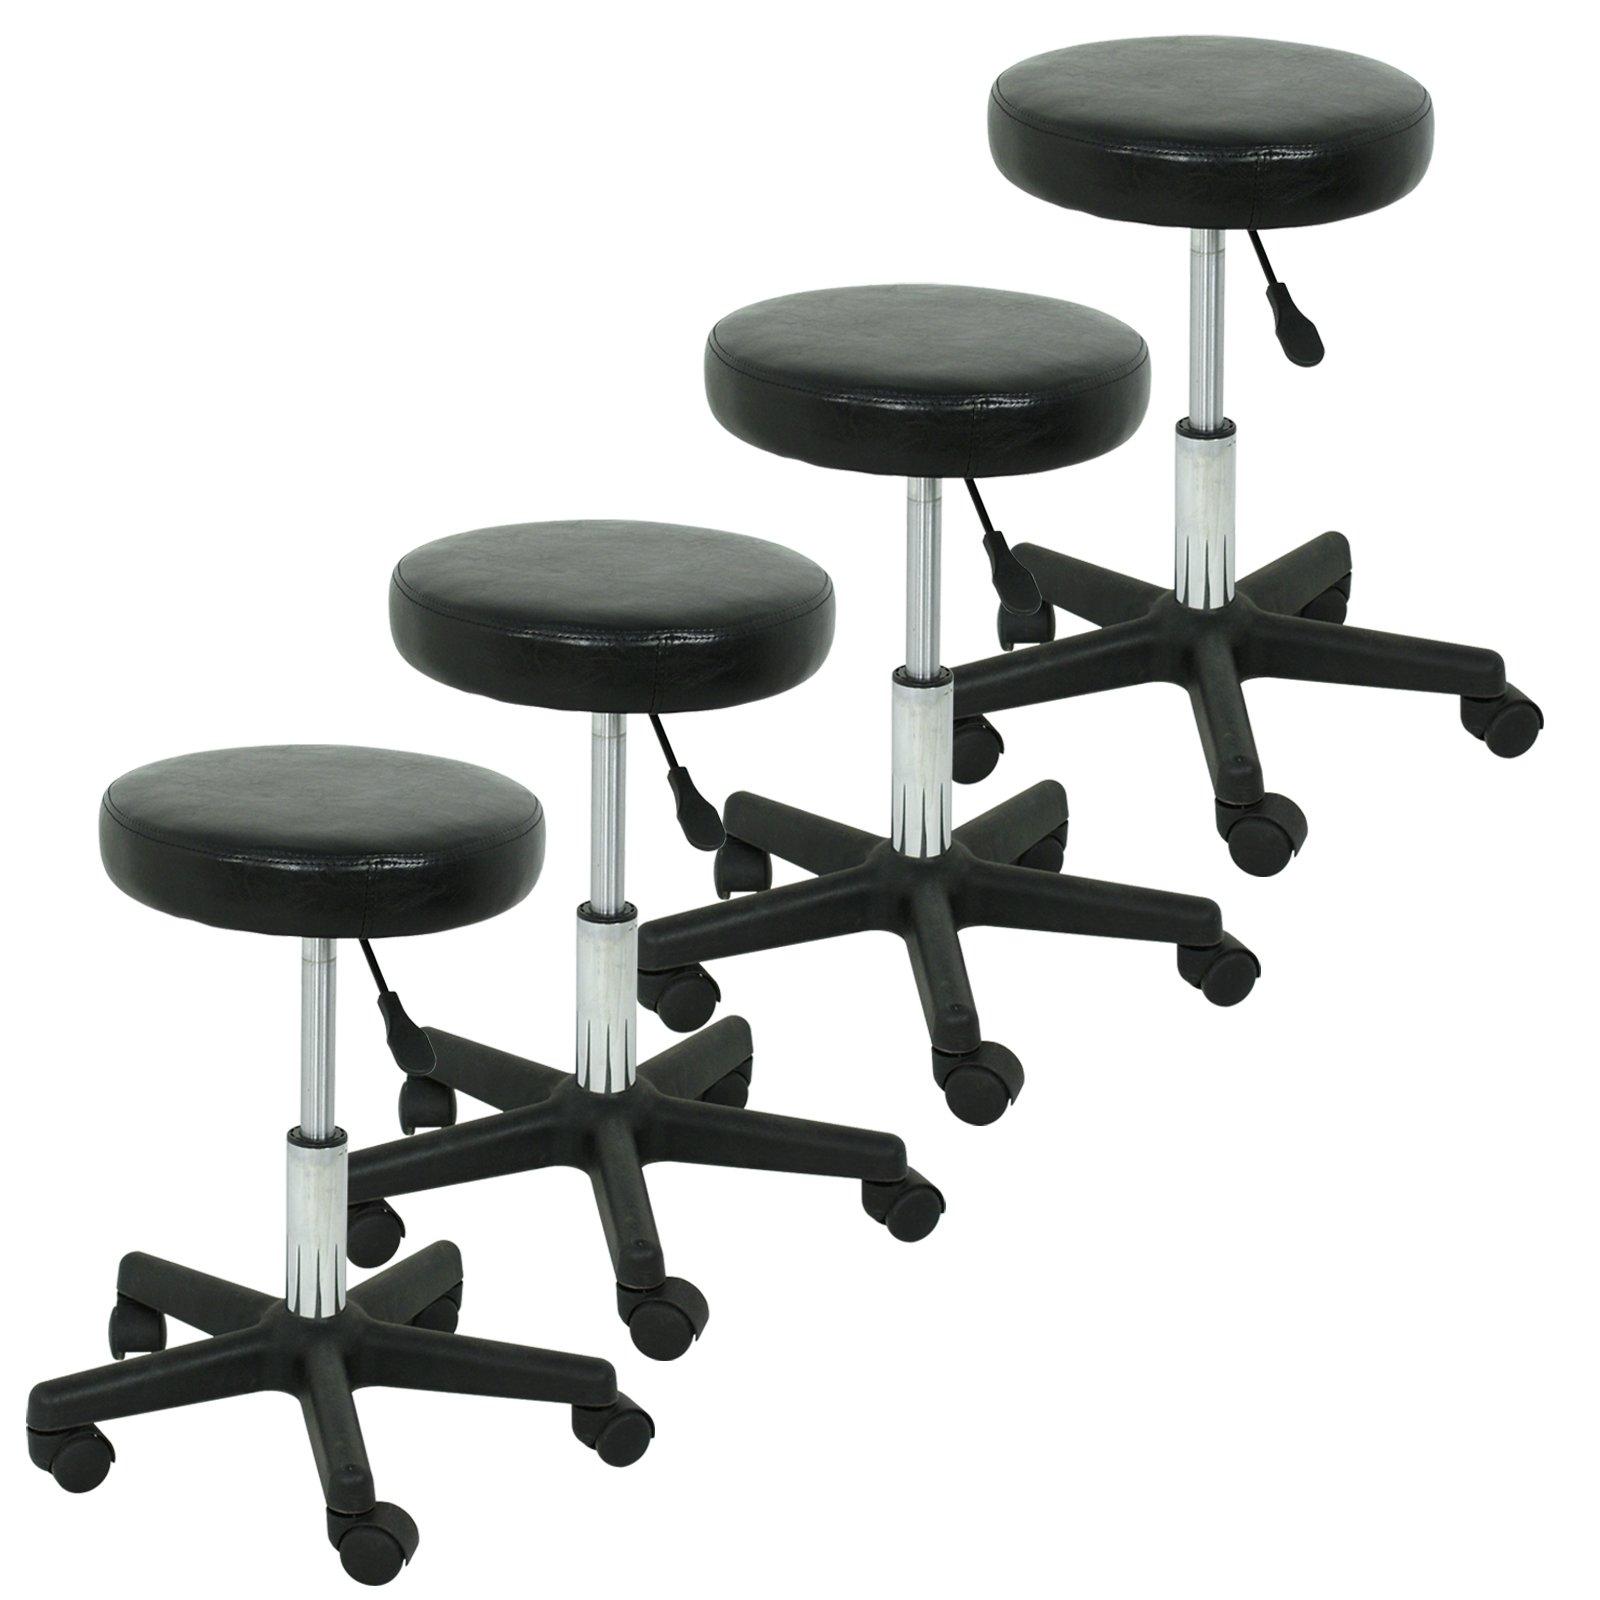 F2C Leather Adjustable Bar Stools Swivel Chairs Facial Massage Spa Salon Stool White/Black (4Pcs Black) by F2C (Image #2)